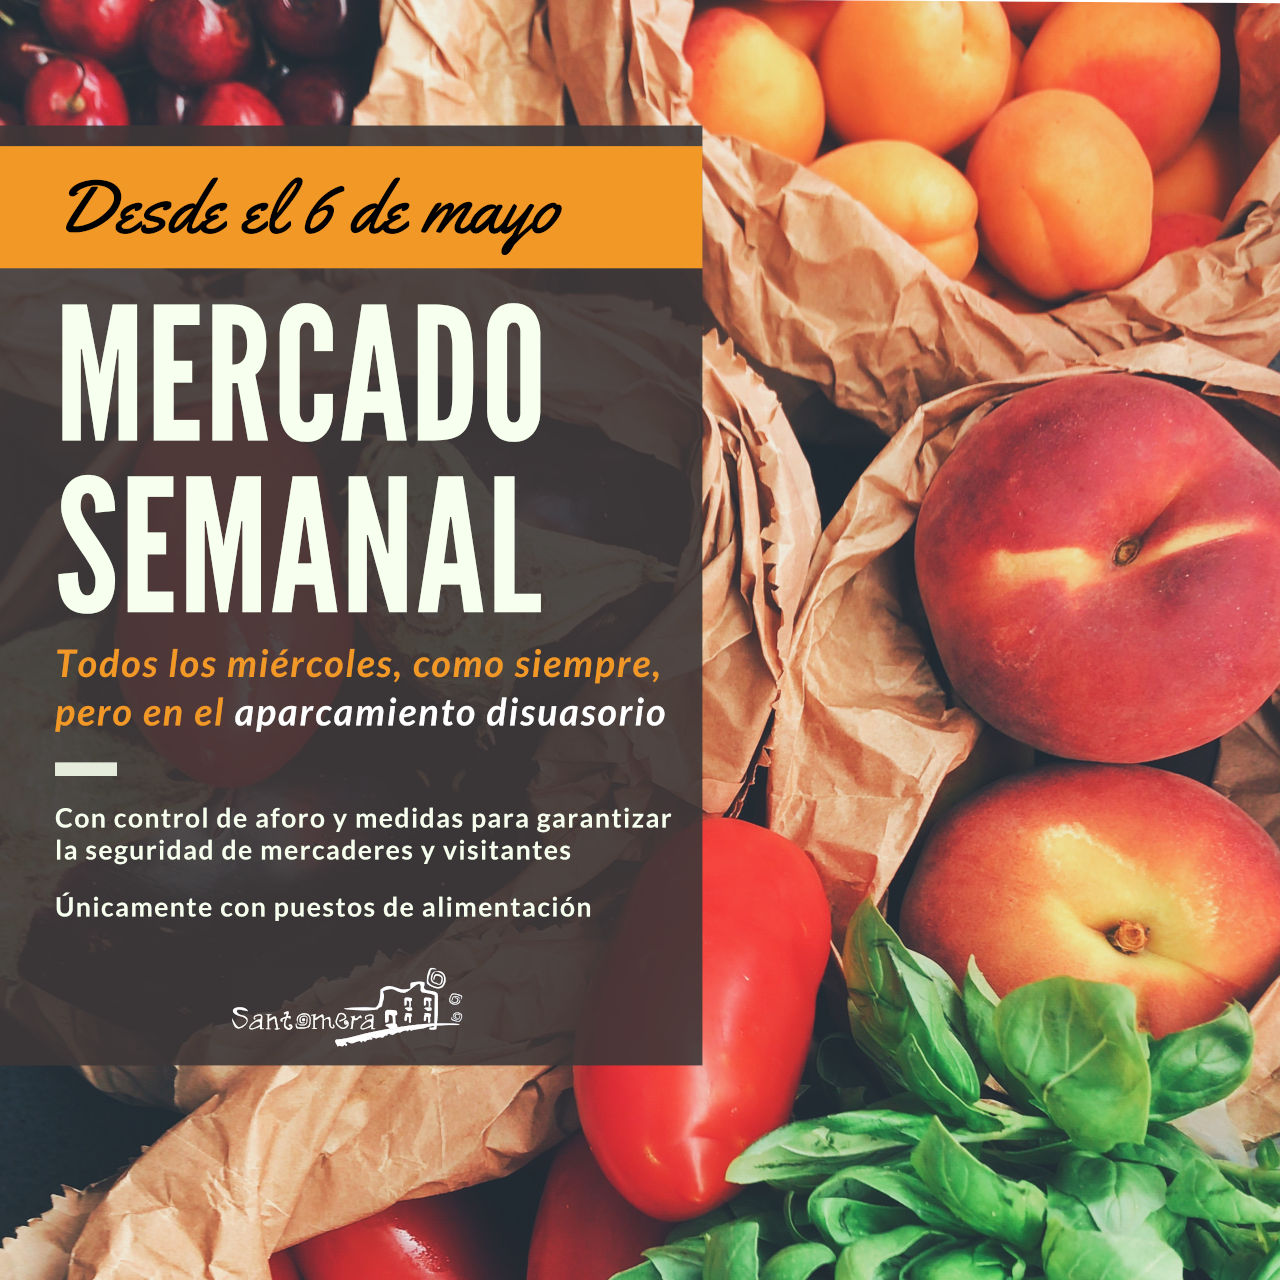 20200503_Mercado semanal